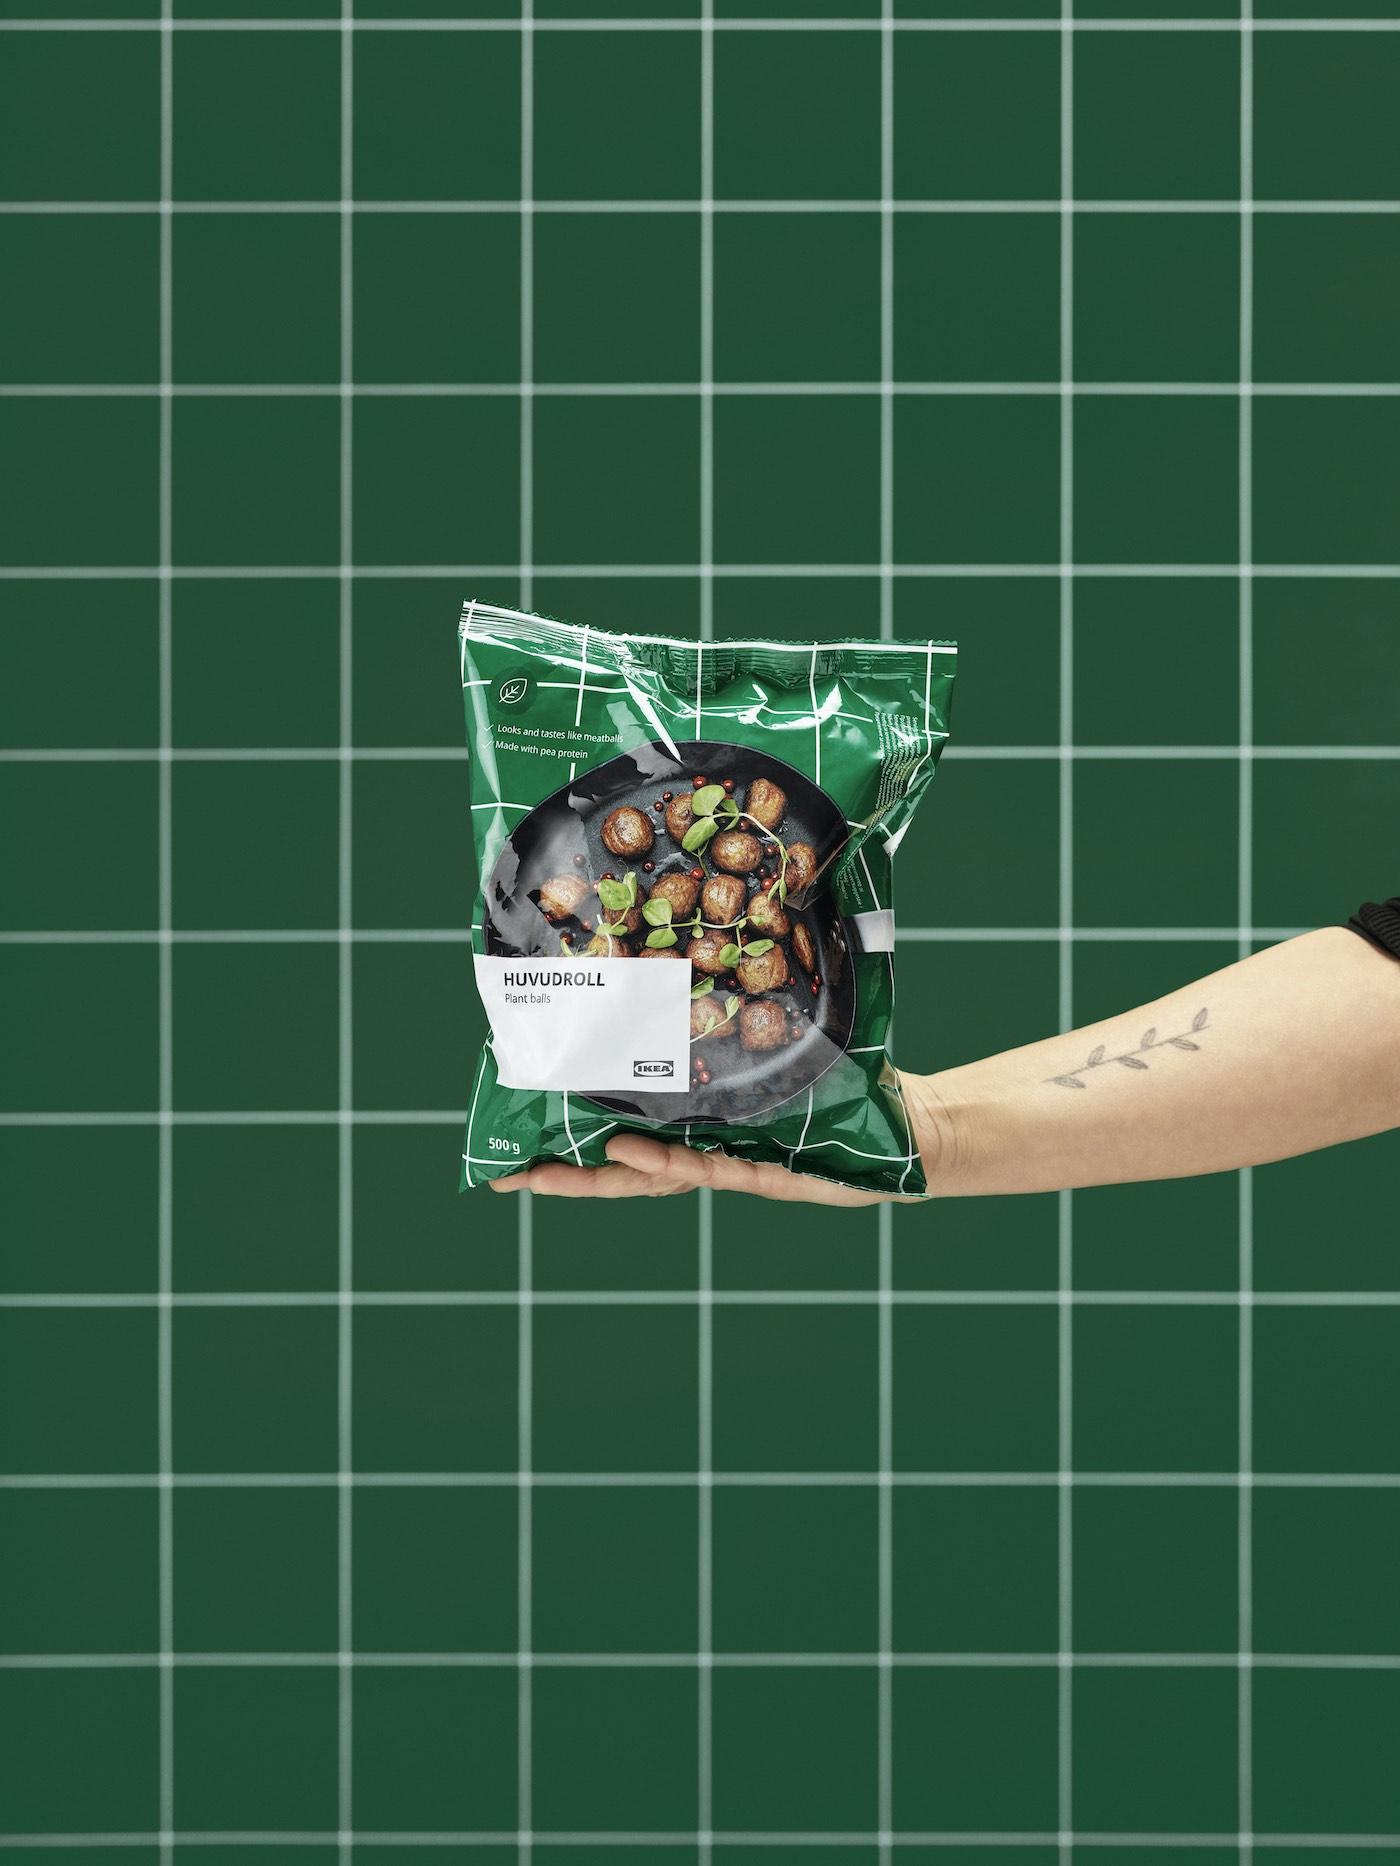 Fleischbällchen, Vegane Köttbullar, Vegetarische Köttbullar, Pflanzliche Köttbullar, IKEA, ohne Fleisch